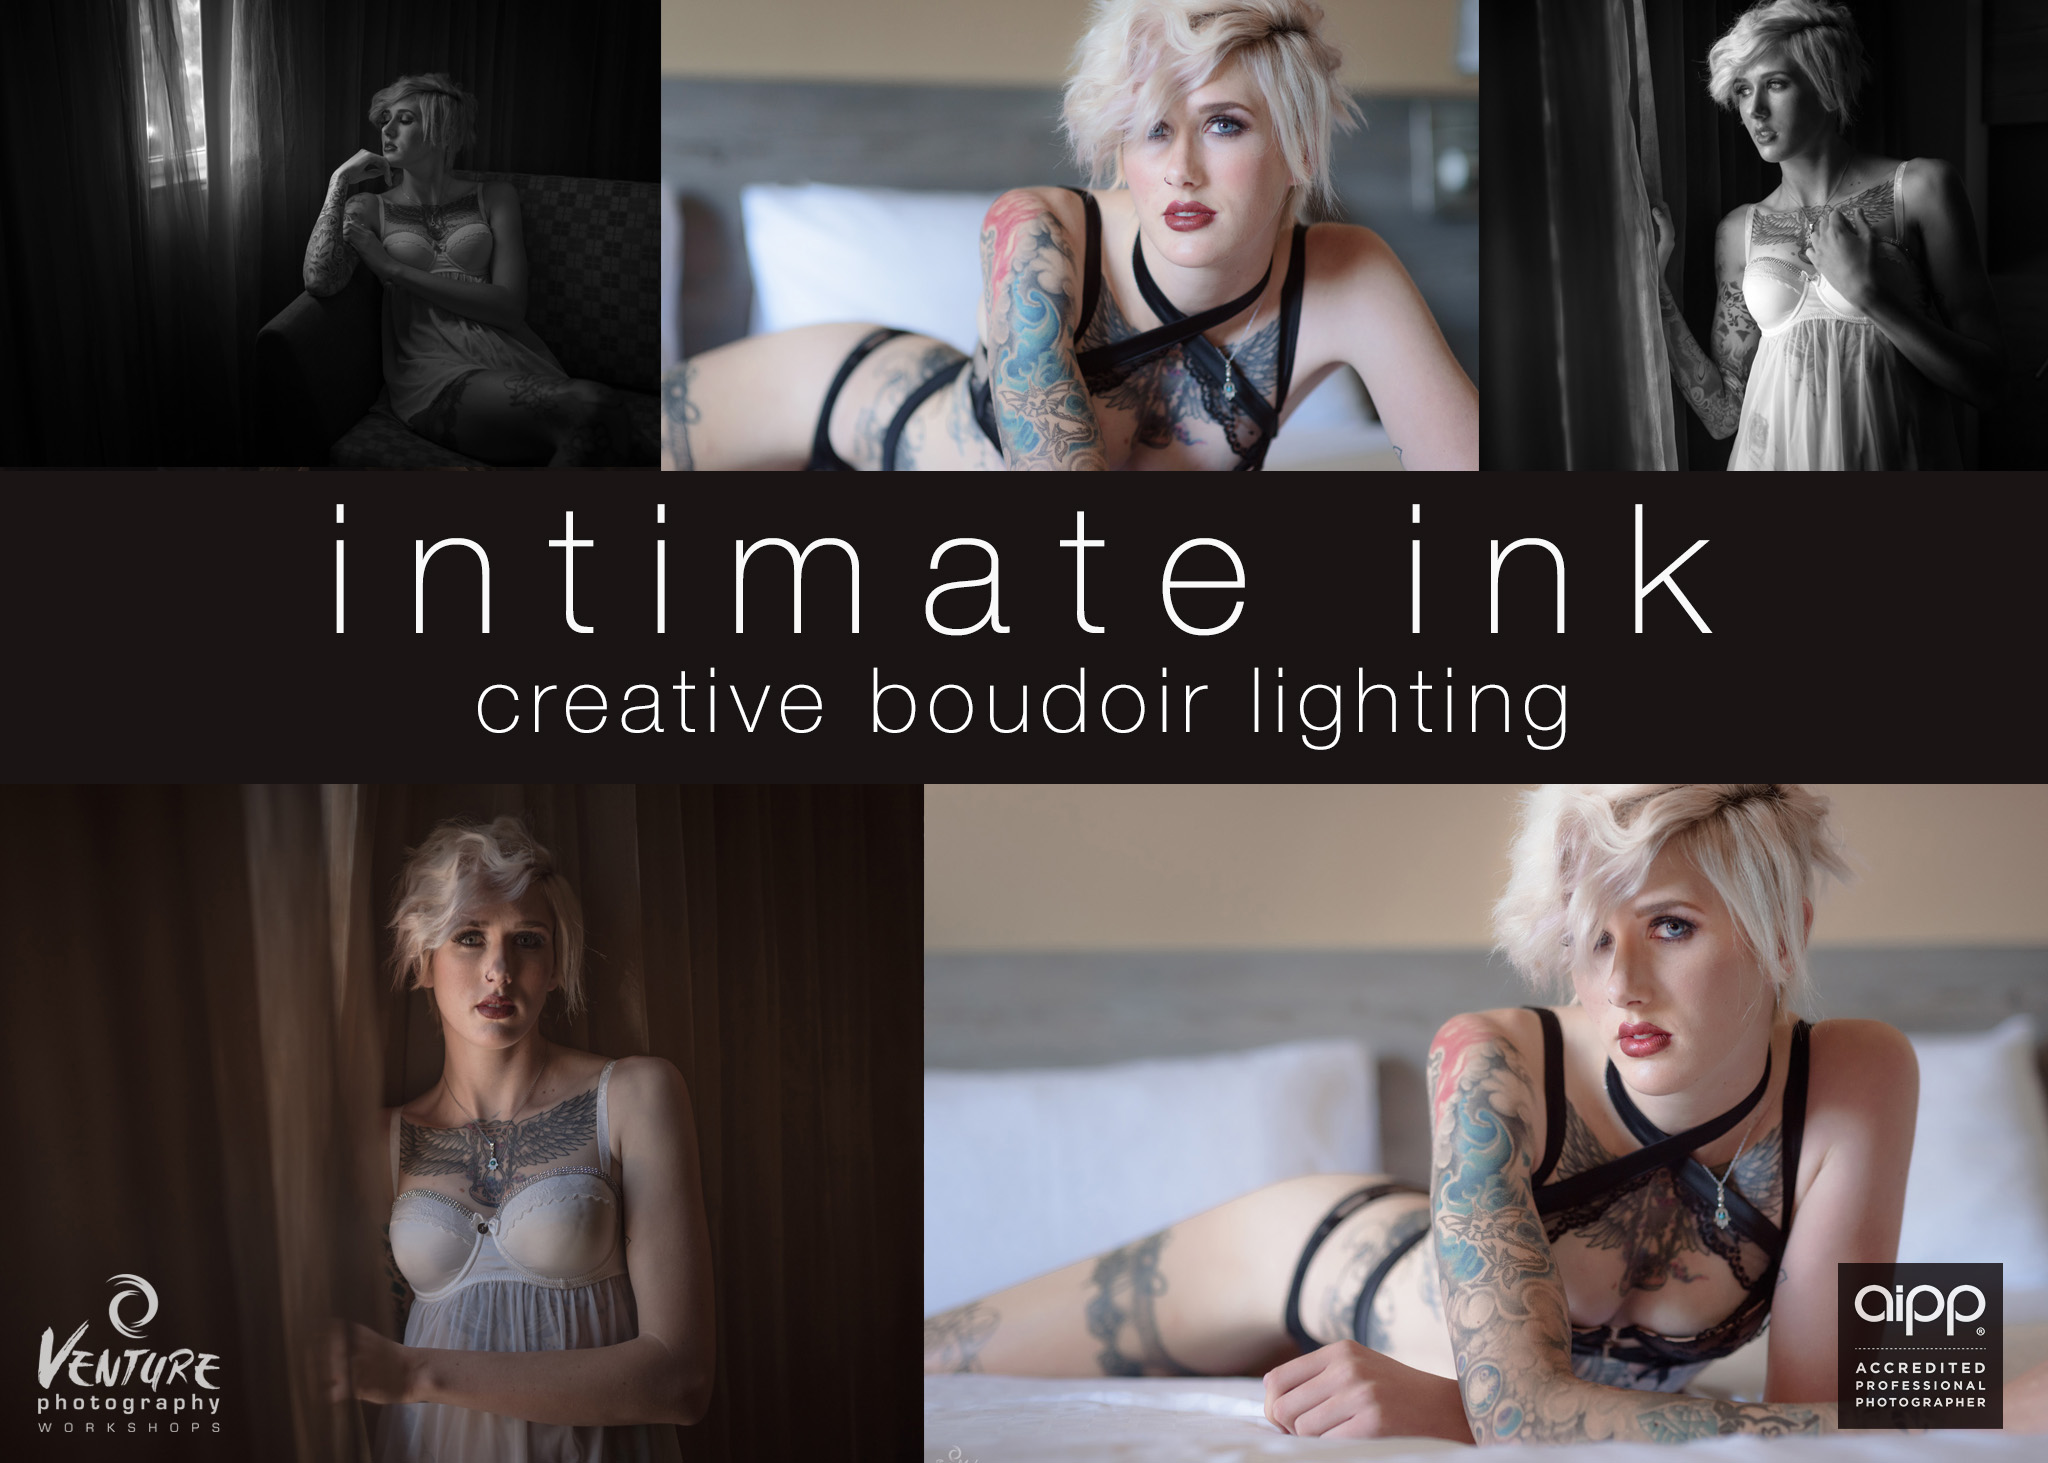 Intimate Ink: Creative Boudoir Lighting